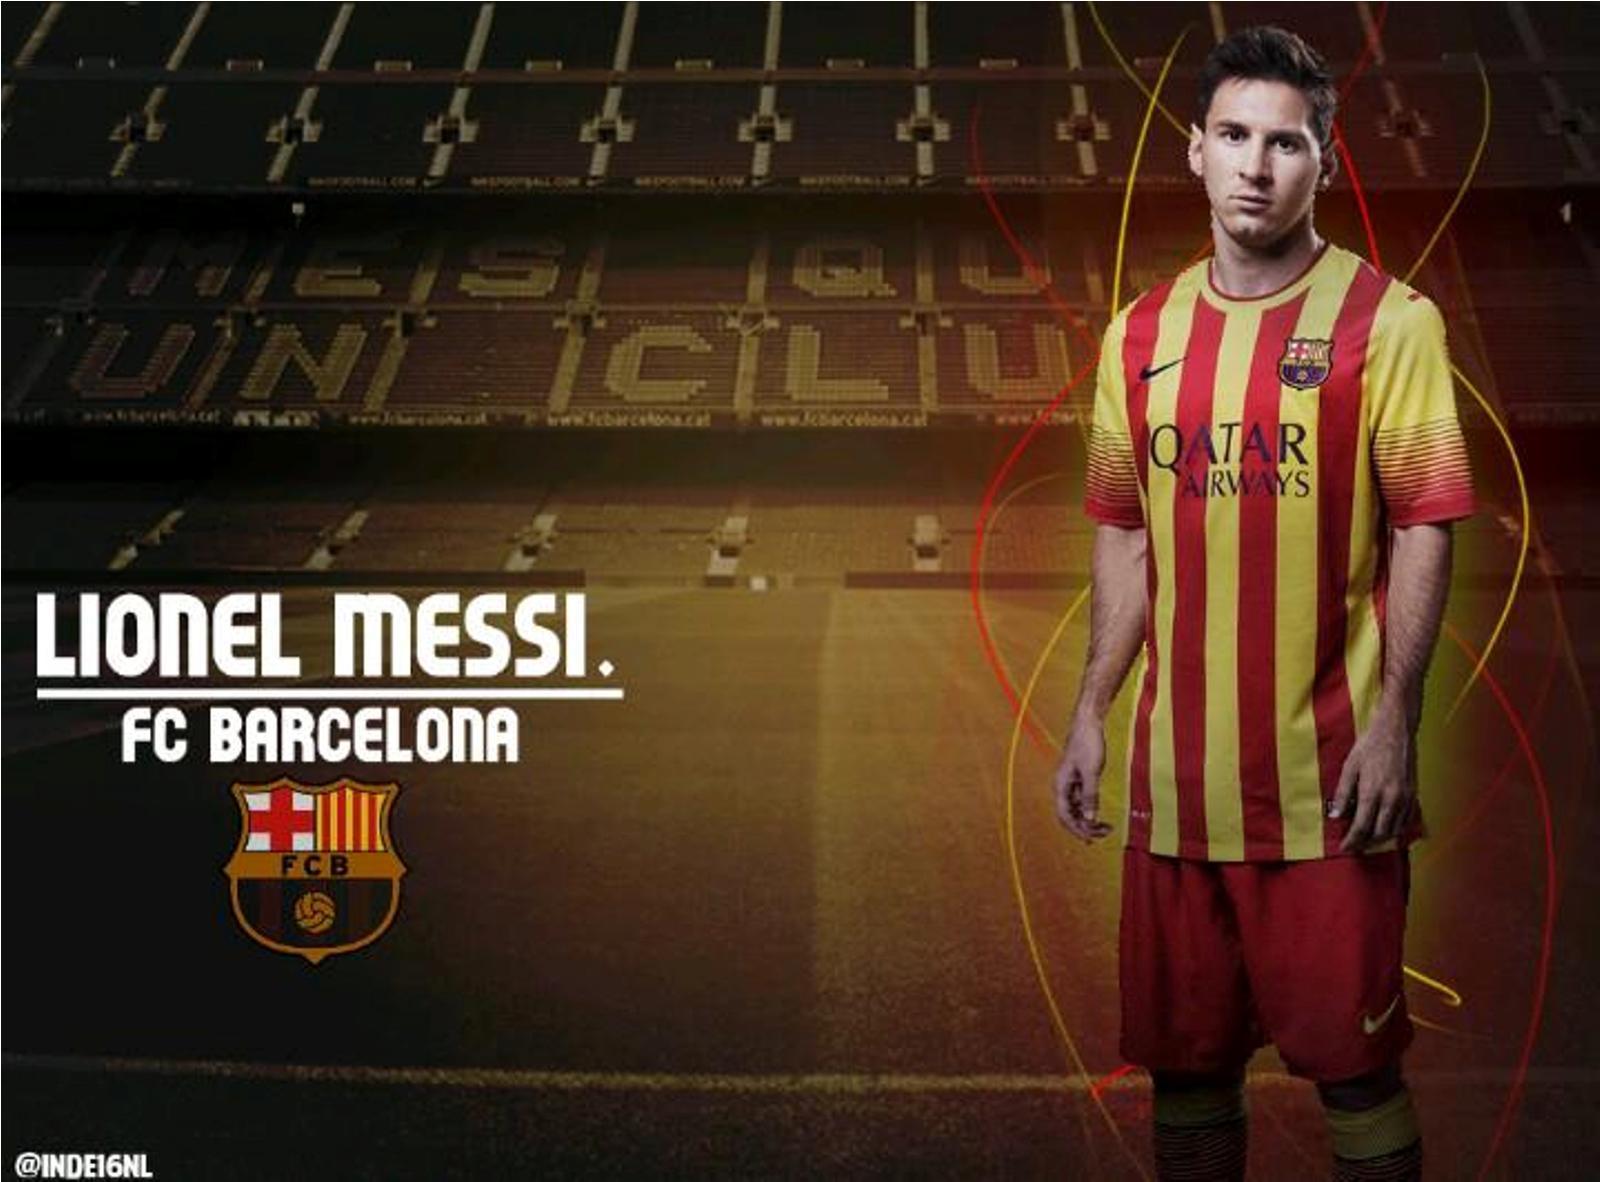 Lionel Messi 2014 Wallpaperjpg 1600x1182